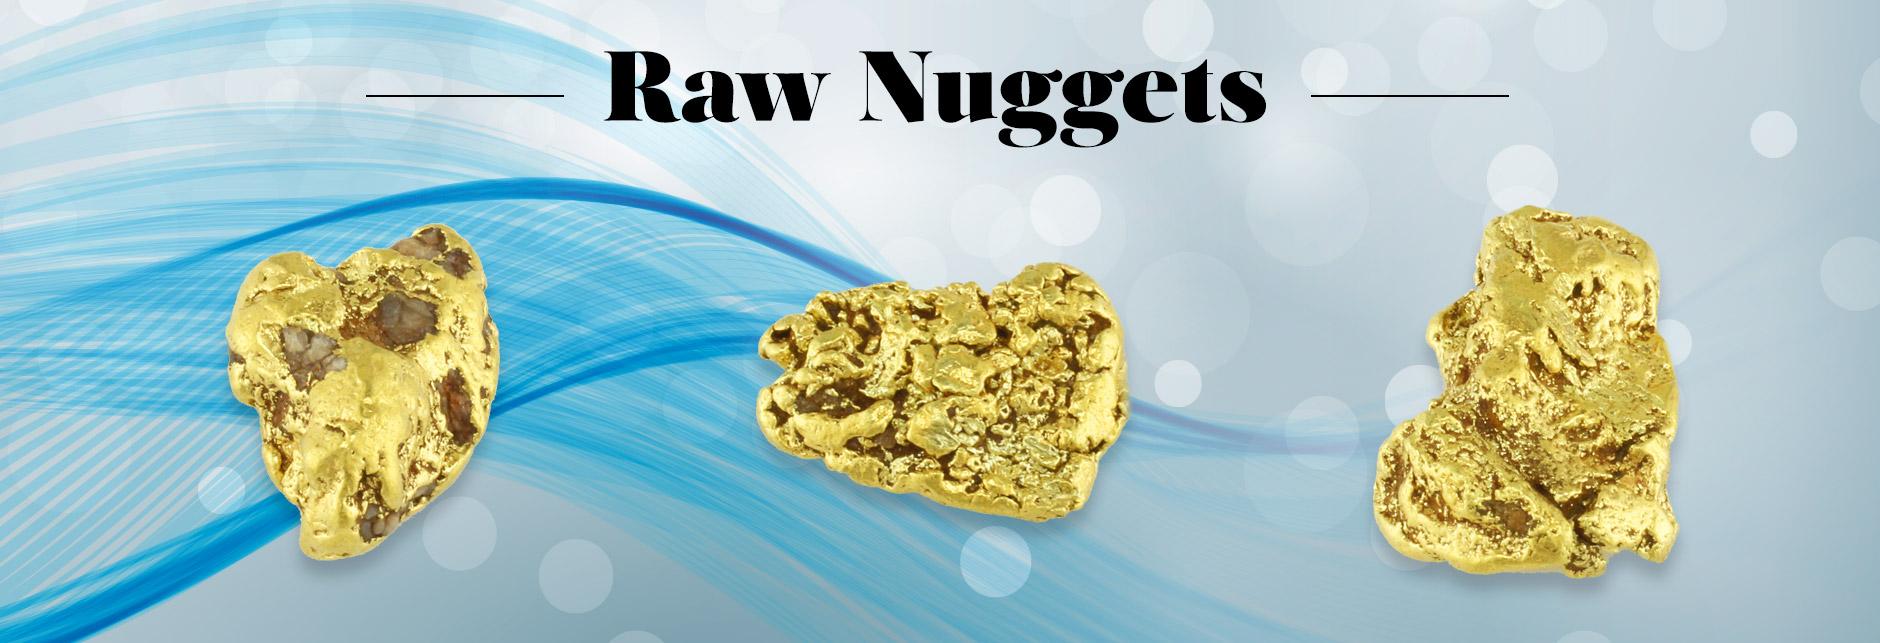 nuggets-header-pic.jpg